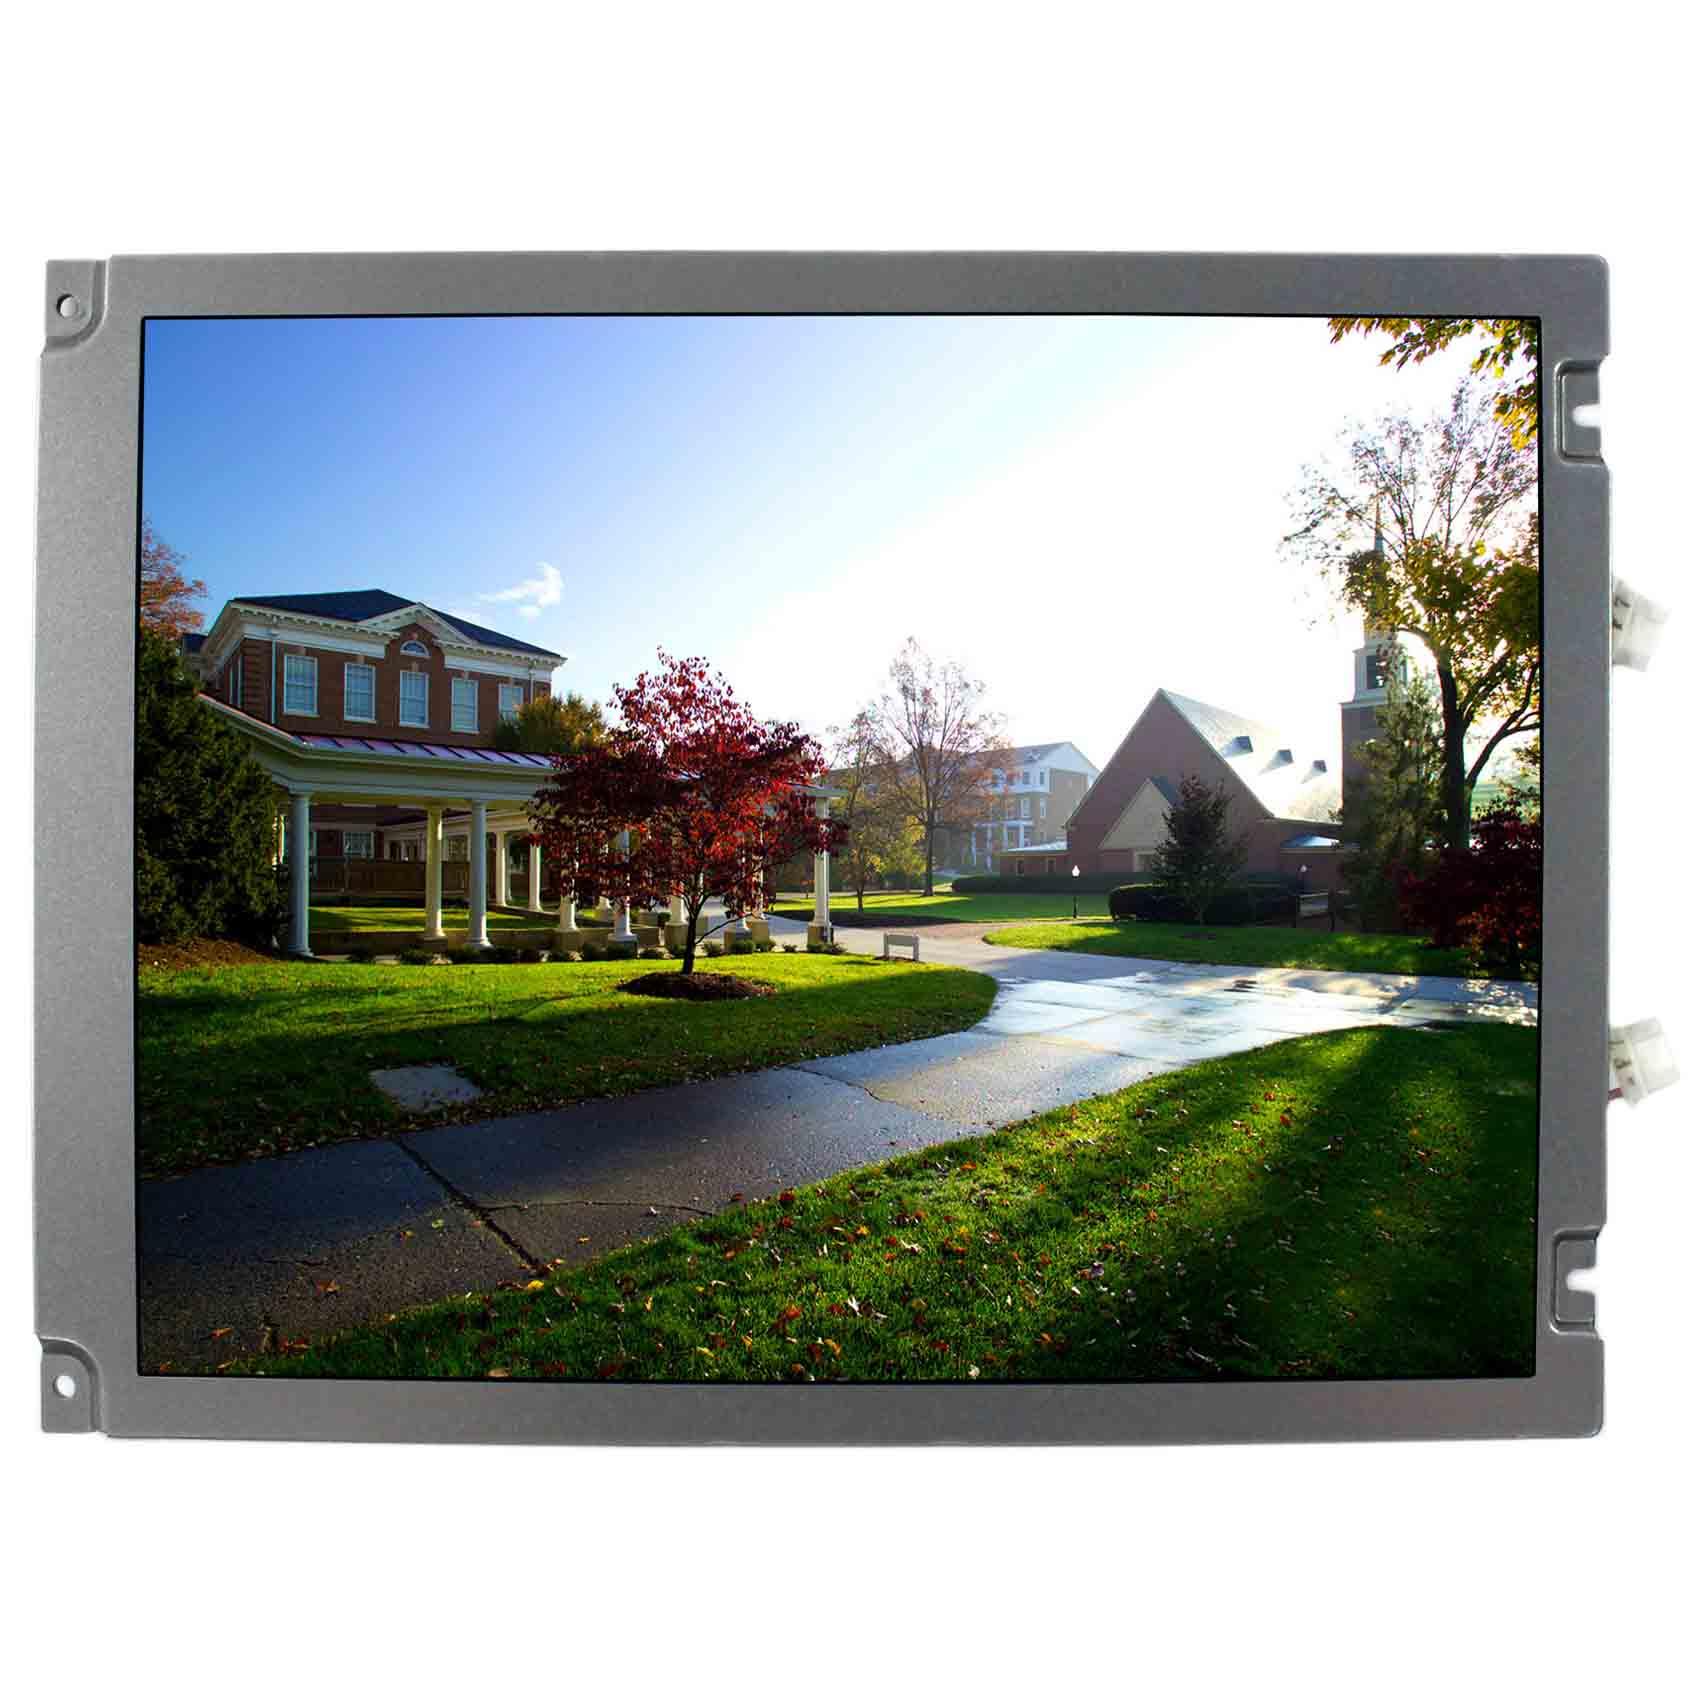 10.4inch AA104SG04 800x600 400cd m2 2 Lamp CCFL Backlight LCD Screen 12 1inch 800x600 lq121s1lg75 lcd screen with led backlight